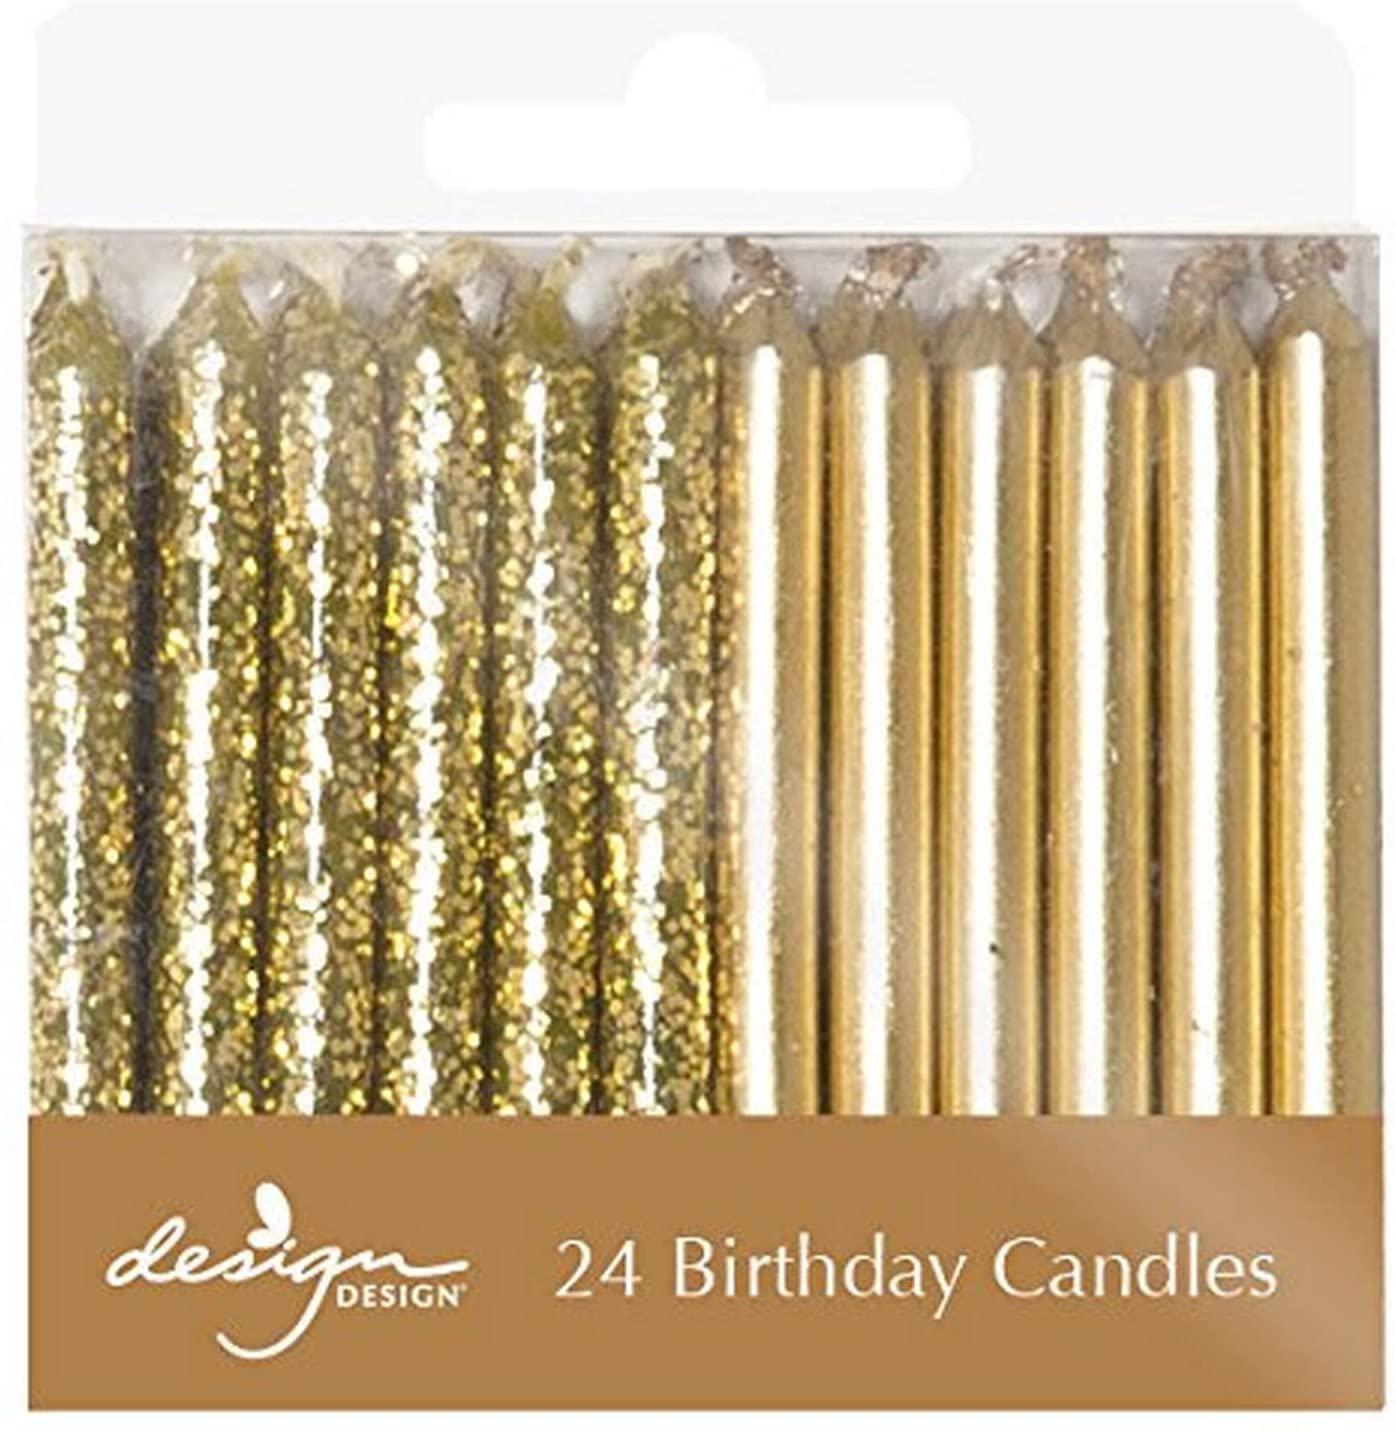 Design Design 756-08010 Metallic Birthday Candles, 1/4 x 2 3/8